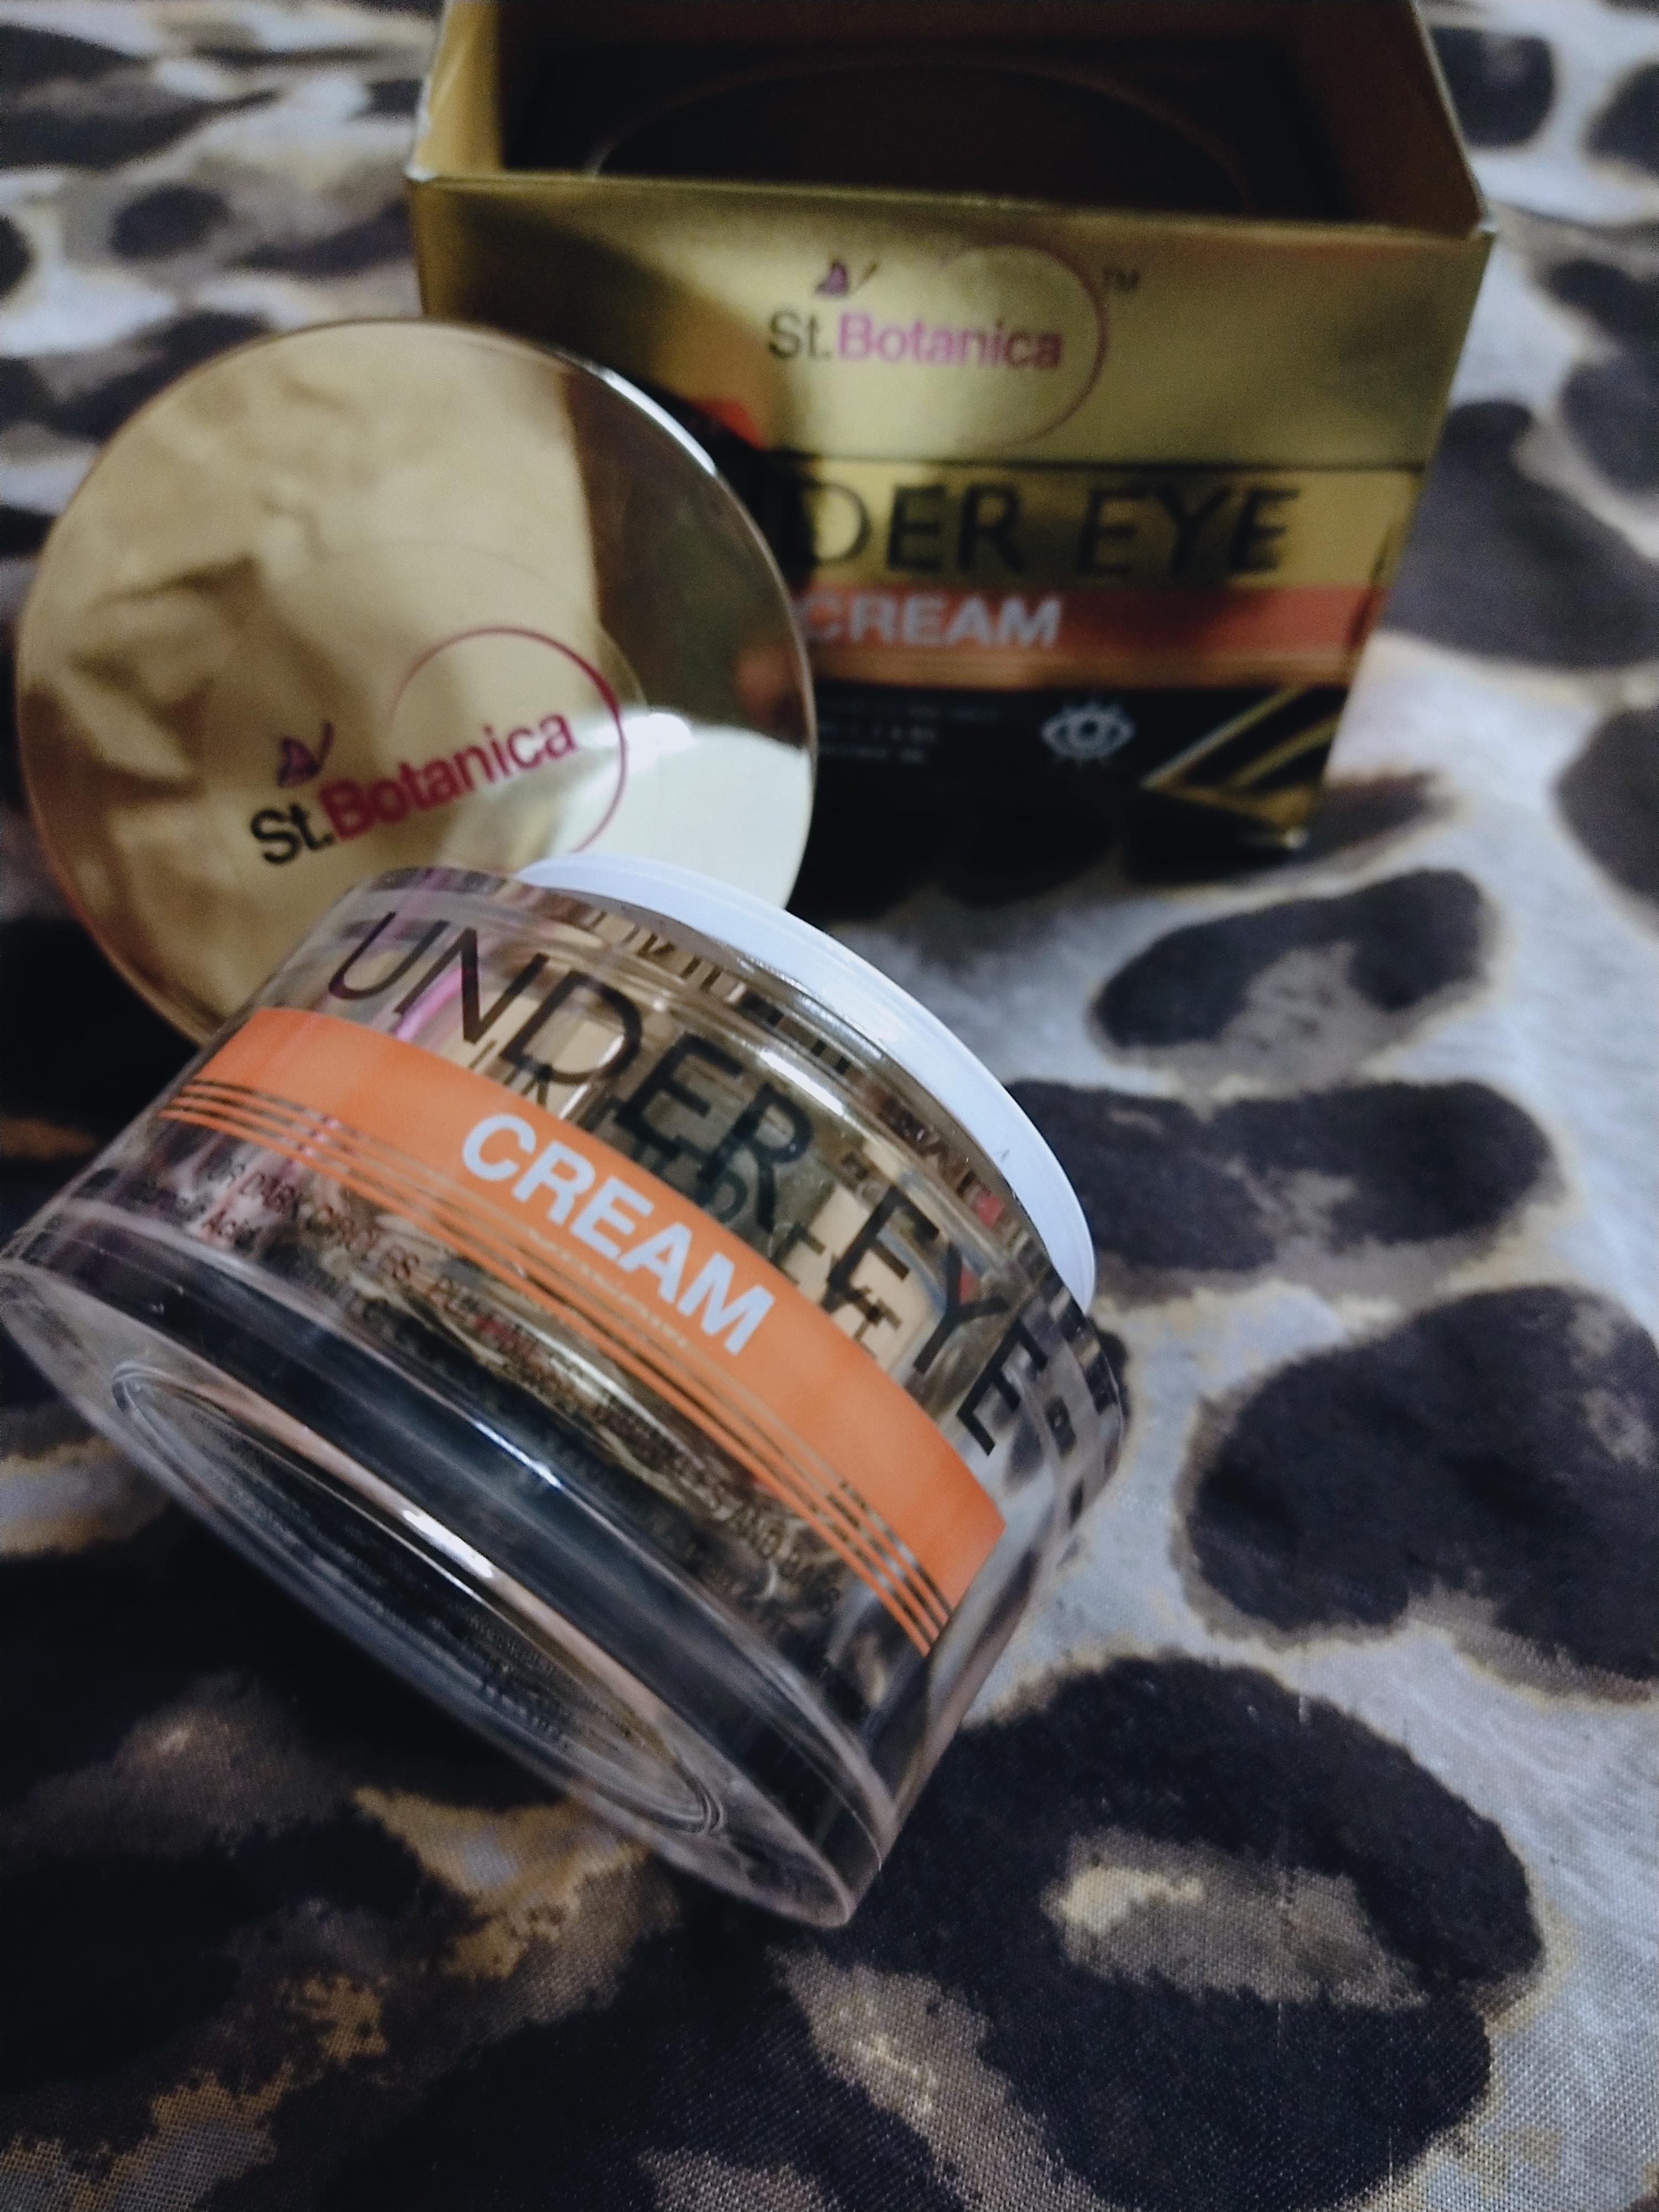 StBotanica Pure Radiance Under Eye Cream -Best product for dark circles-By tajmim_rahmani